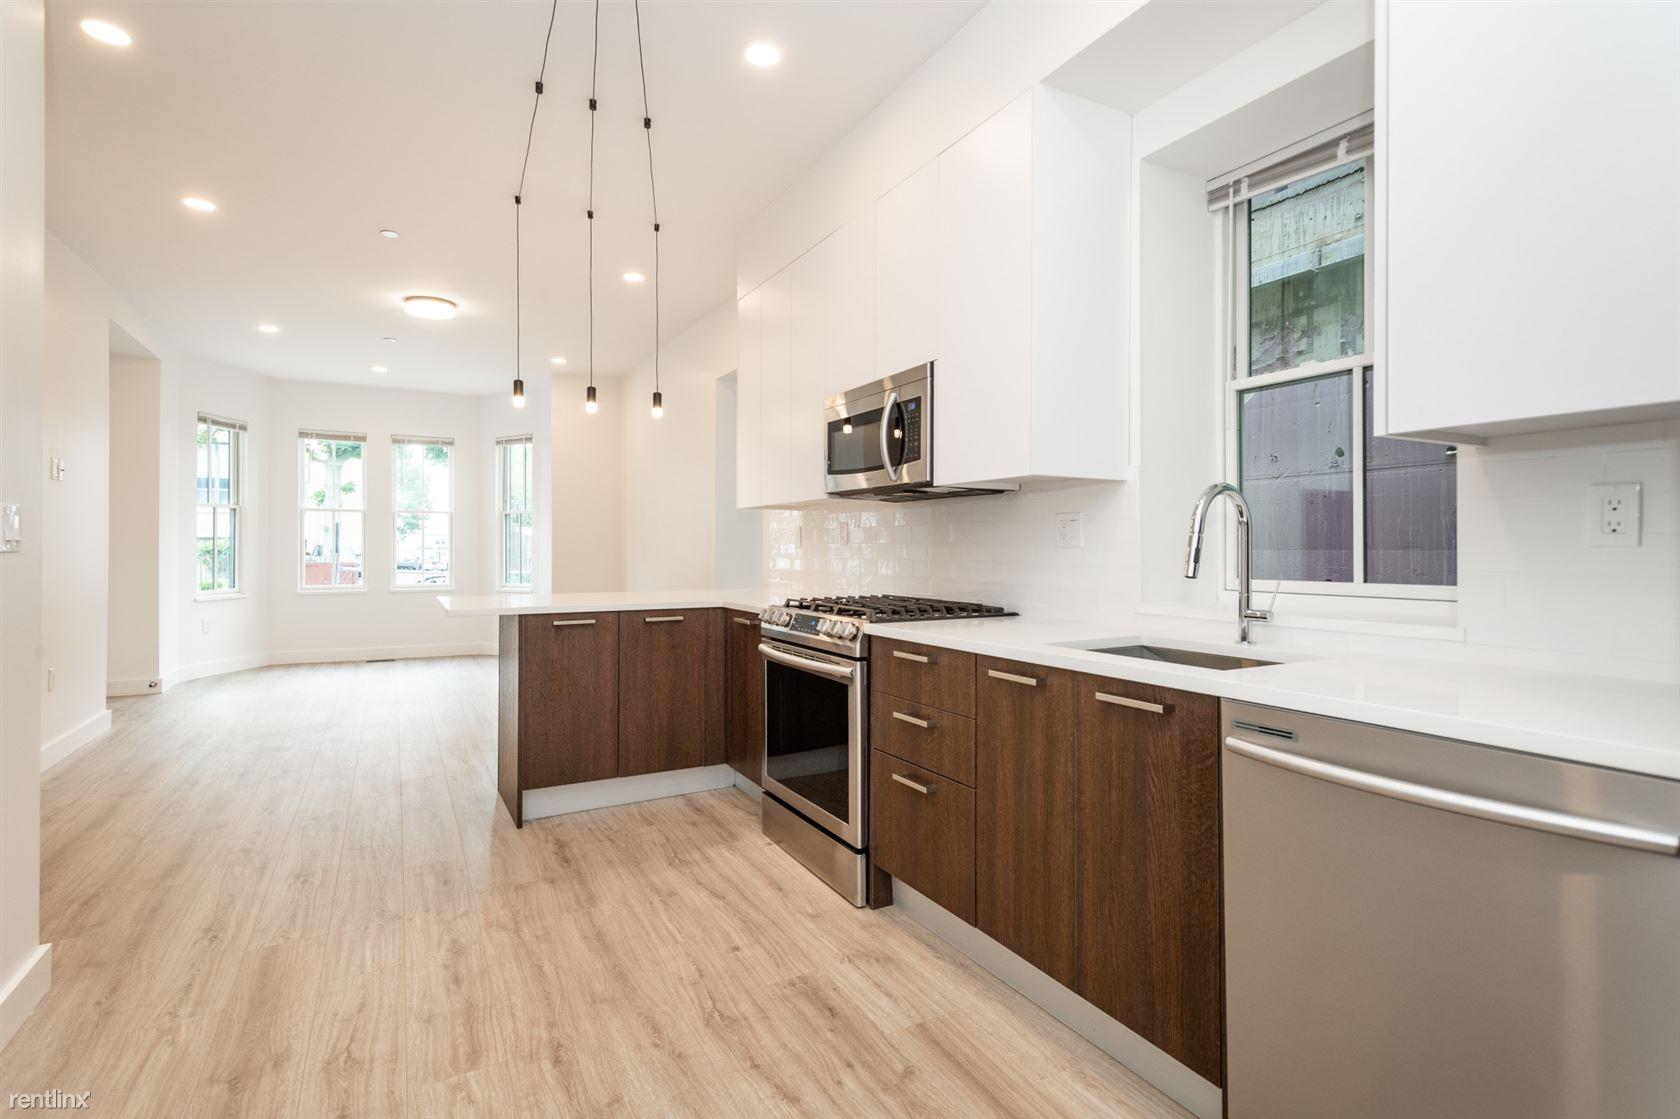 1472 Tremont St # 2, Boston, MA - $5,400